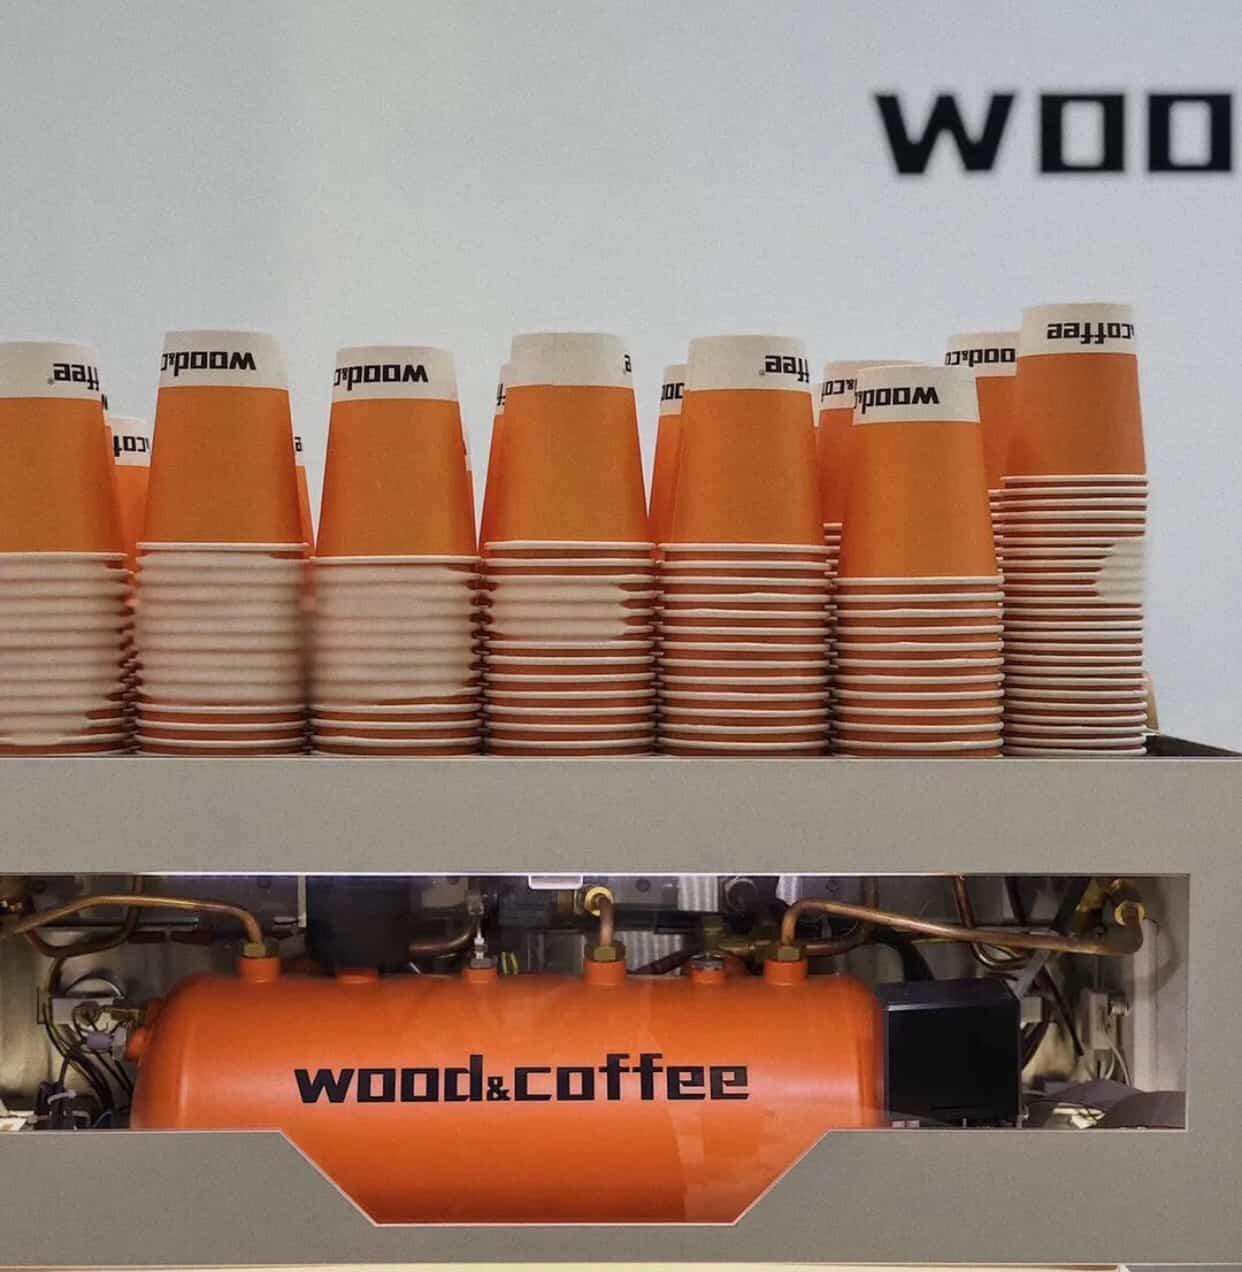 woodcoffee logo chengdu expat 1